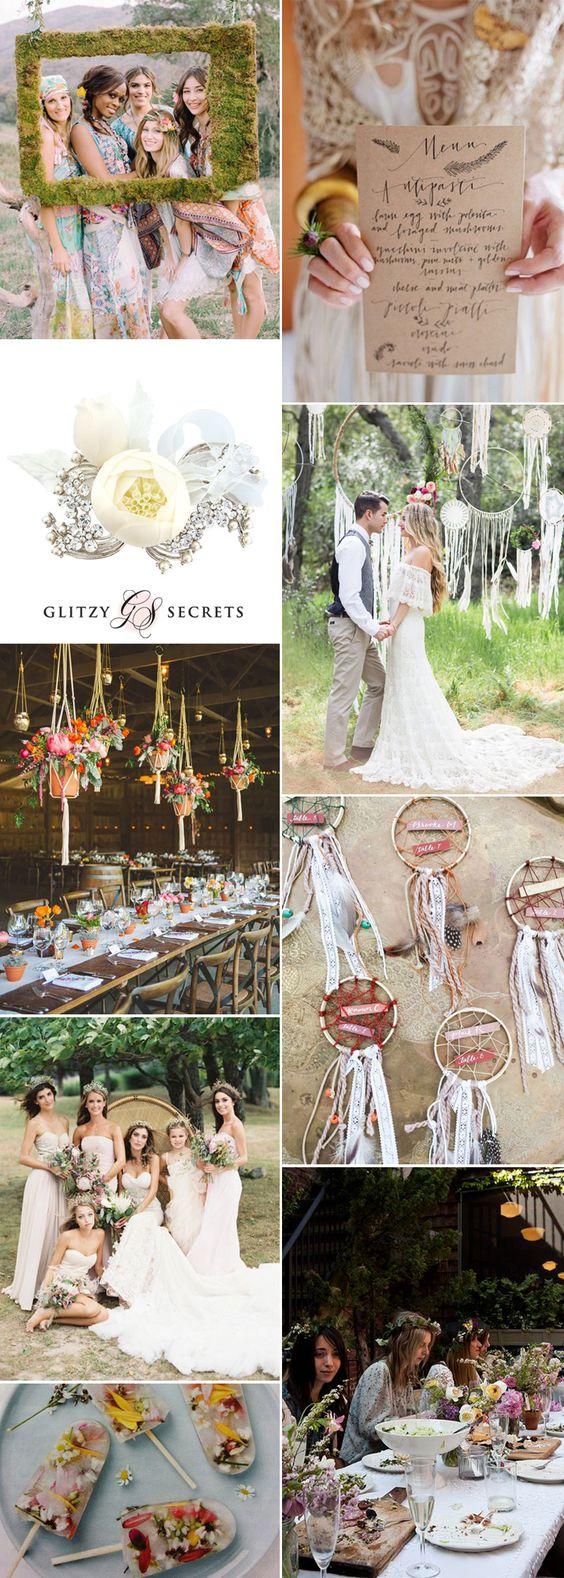 Gorgeous 1970s boho wedding ideas on GS Inspiration - Glitzy Secrets